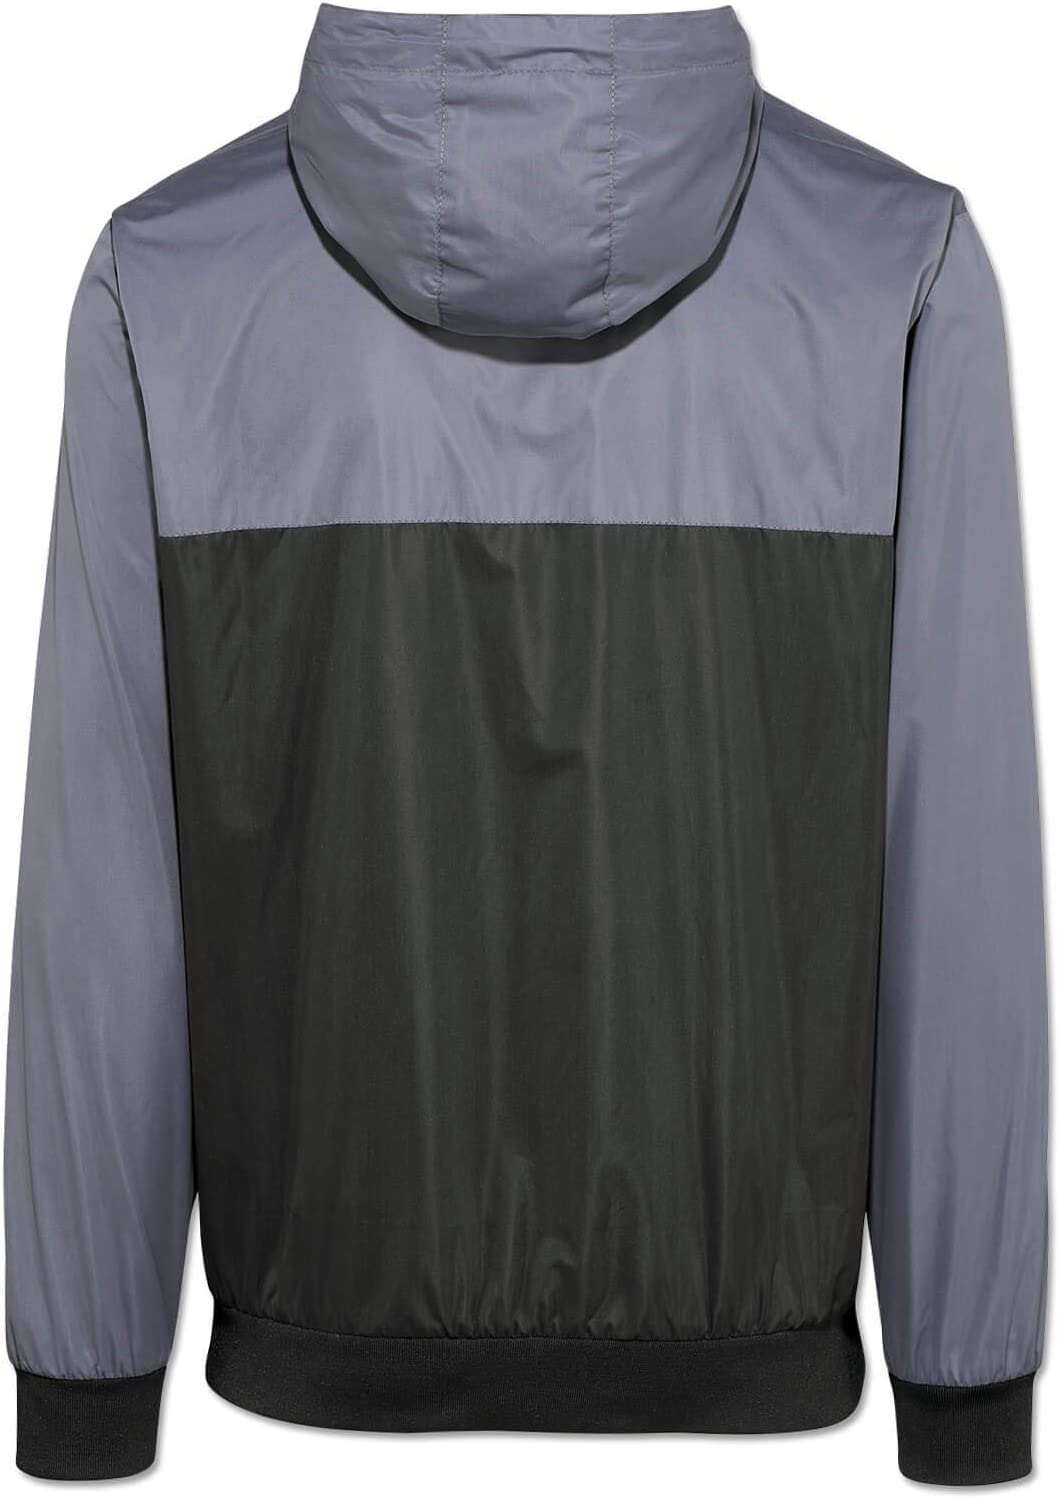 Borussia Dortmund Windbreaker Jacket Amazon Co Uk Sports Outdoors